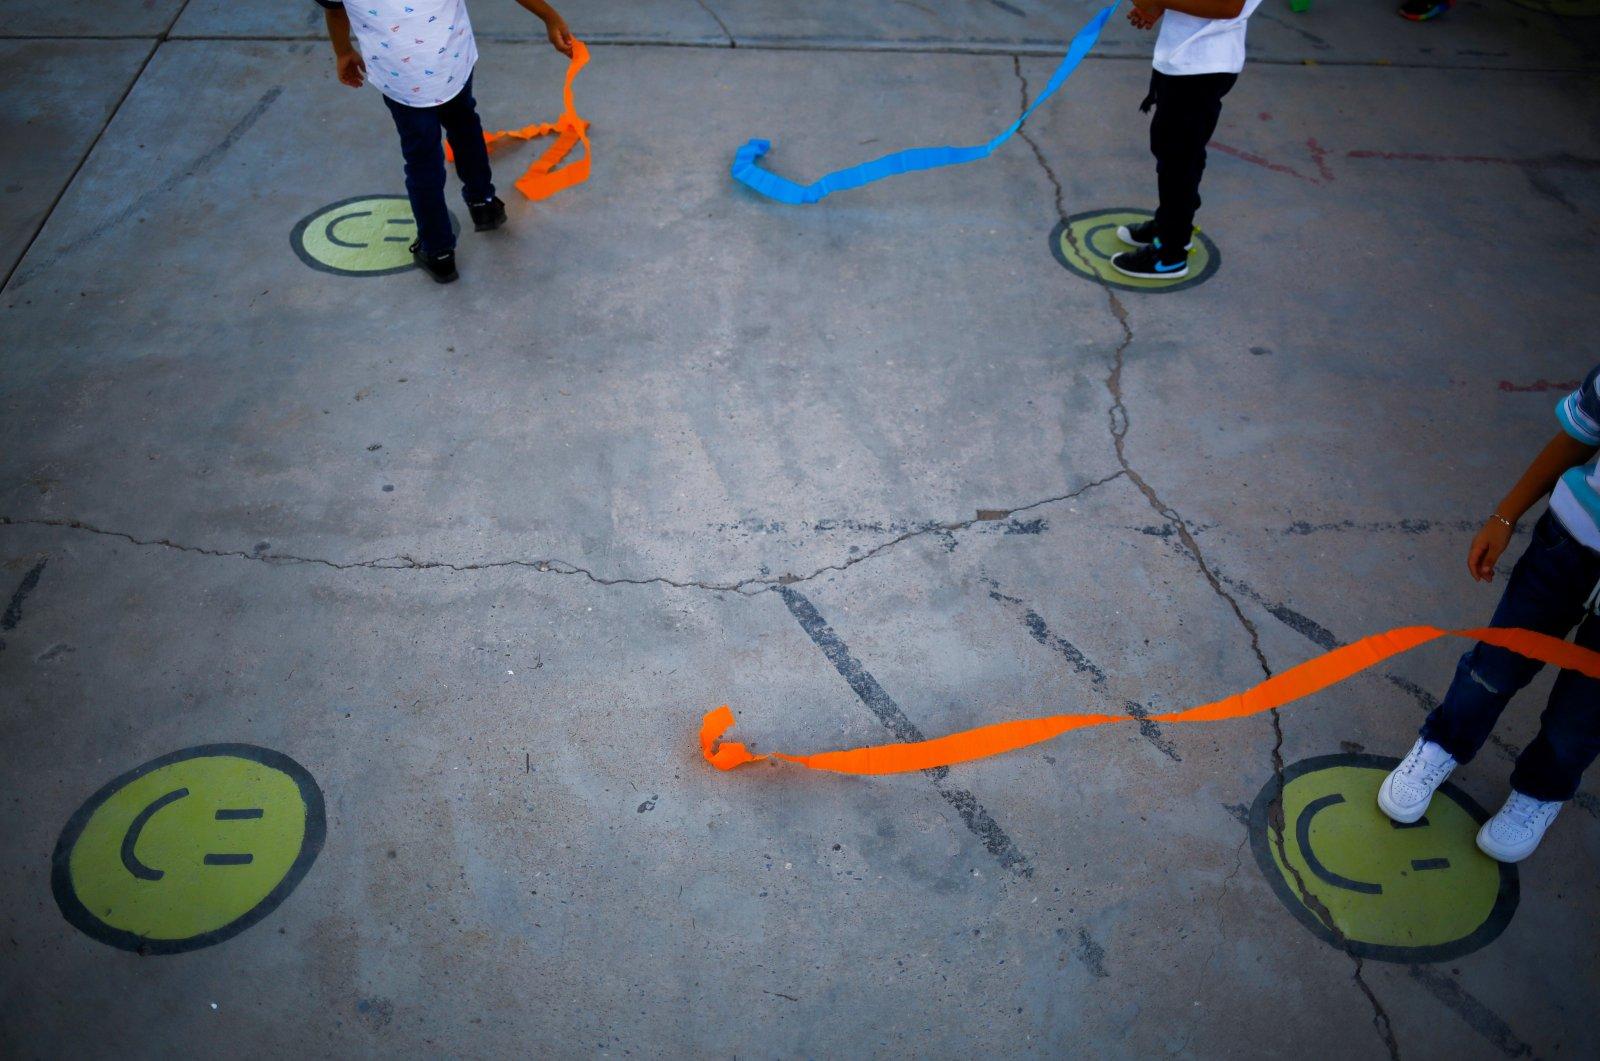 Smile emoticons are seen on the floor of a kindergarten, Ciudad Juarez, Mexico, Aug. 30, 2021. (Reuters Photo)